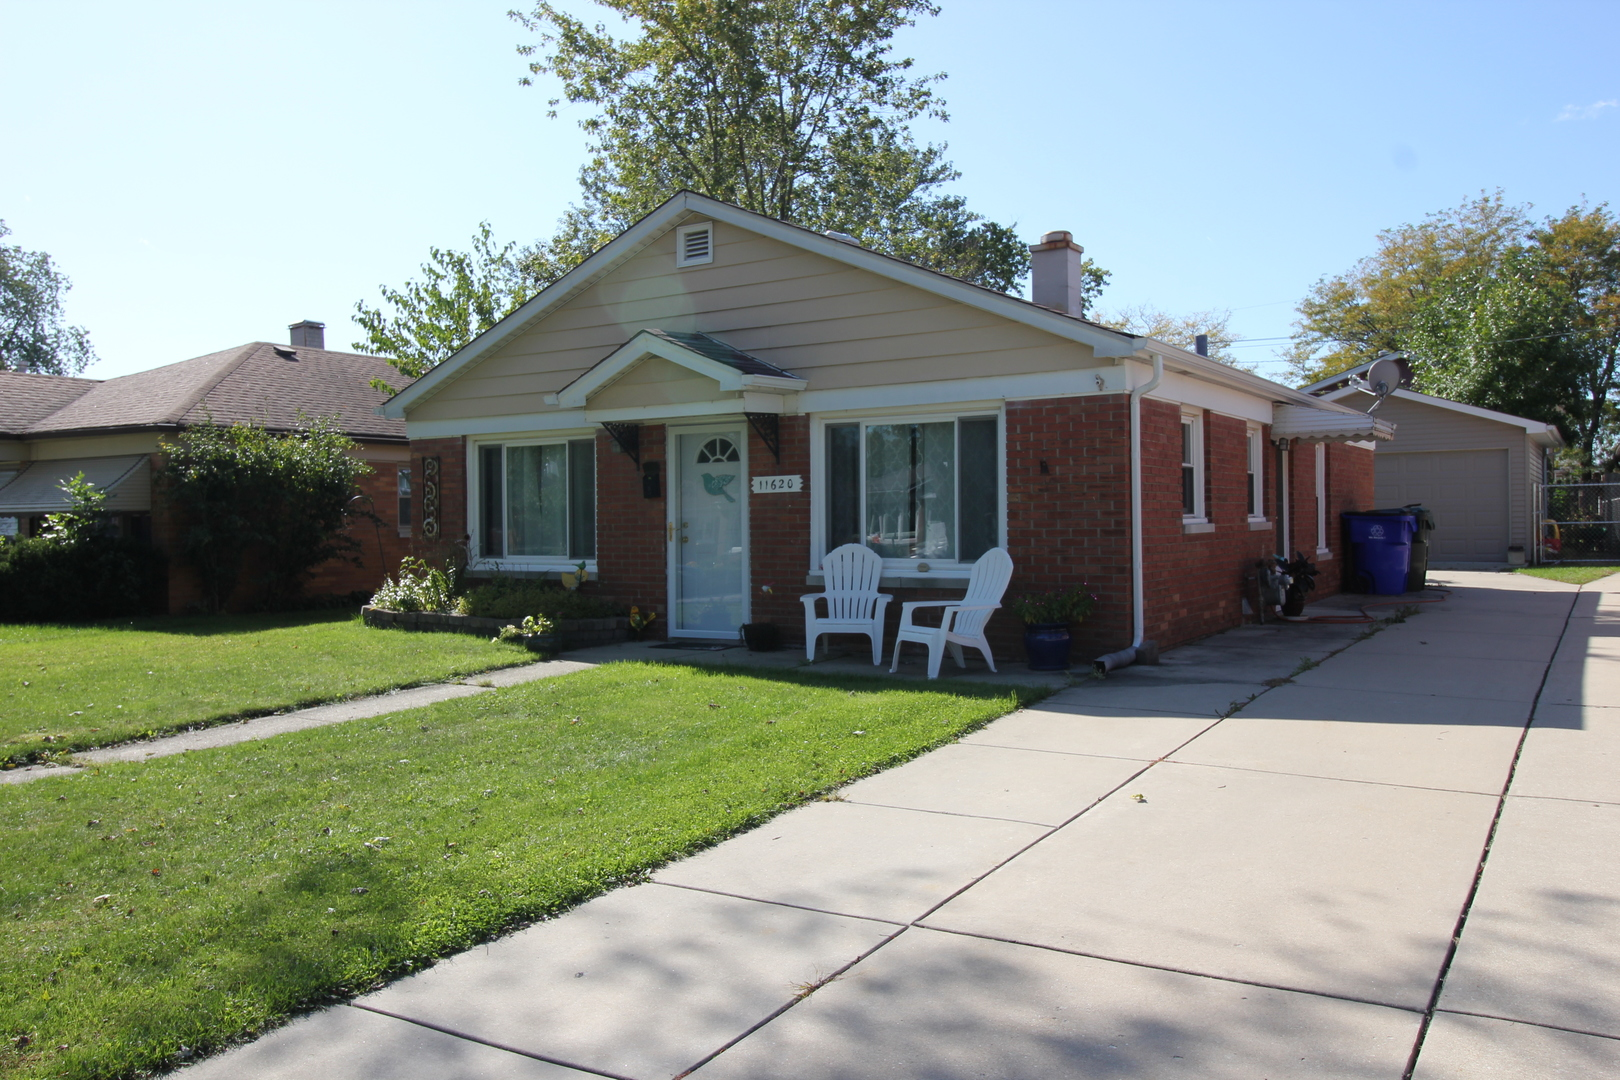 Photo of 11620 Harry J Rogowski Drive Merrionette Park Illinois 60803